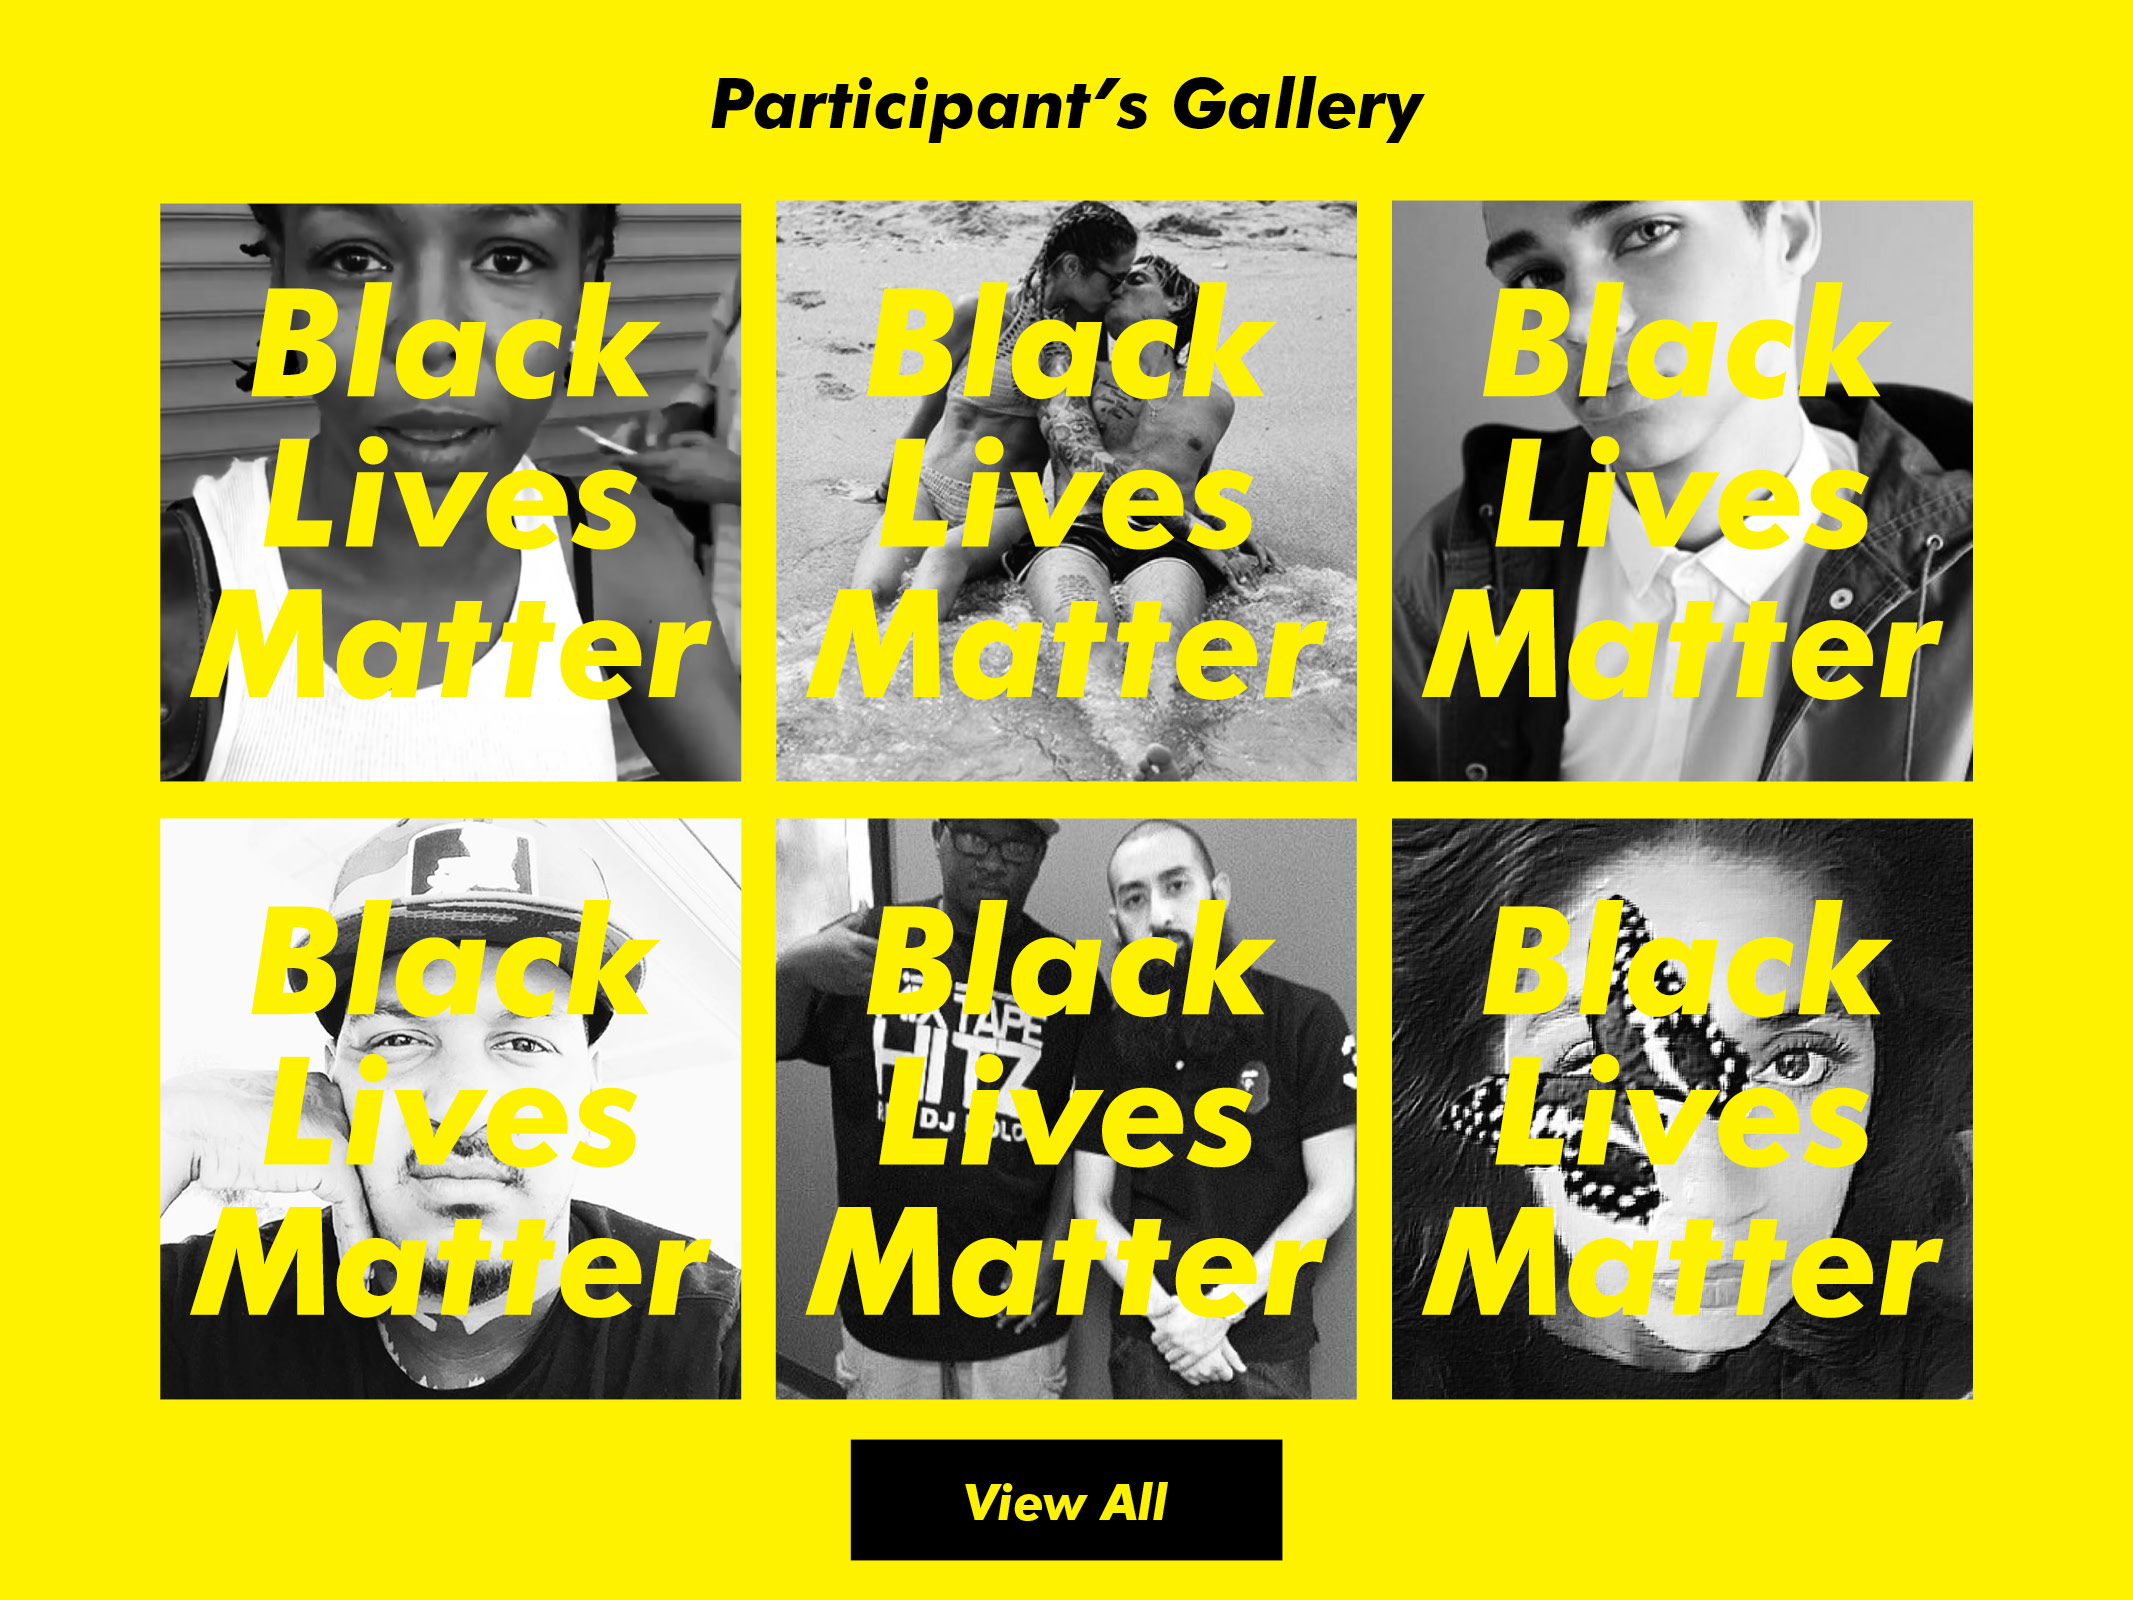 nicholas-konert-black-lives-matter-360-campaign-proposal-04.jpg